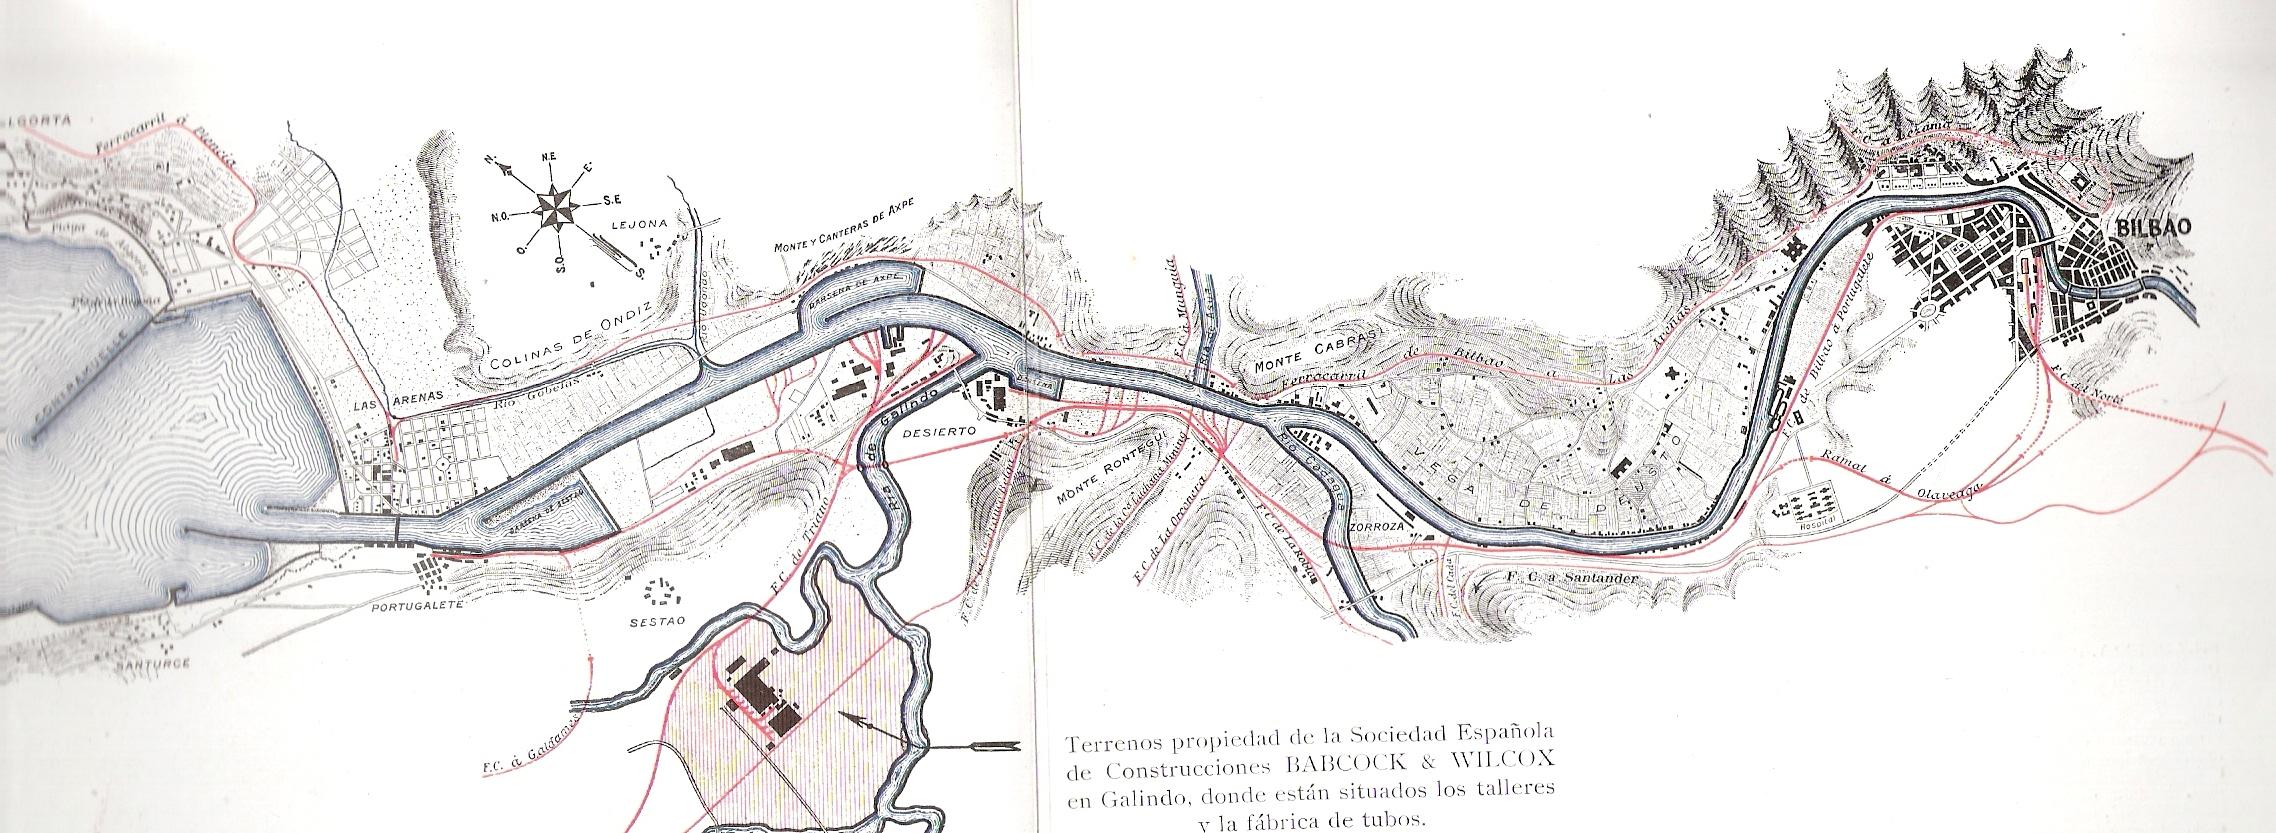 Ria de Bilbao- Fondo Babcock & Wilcox